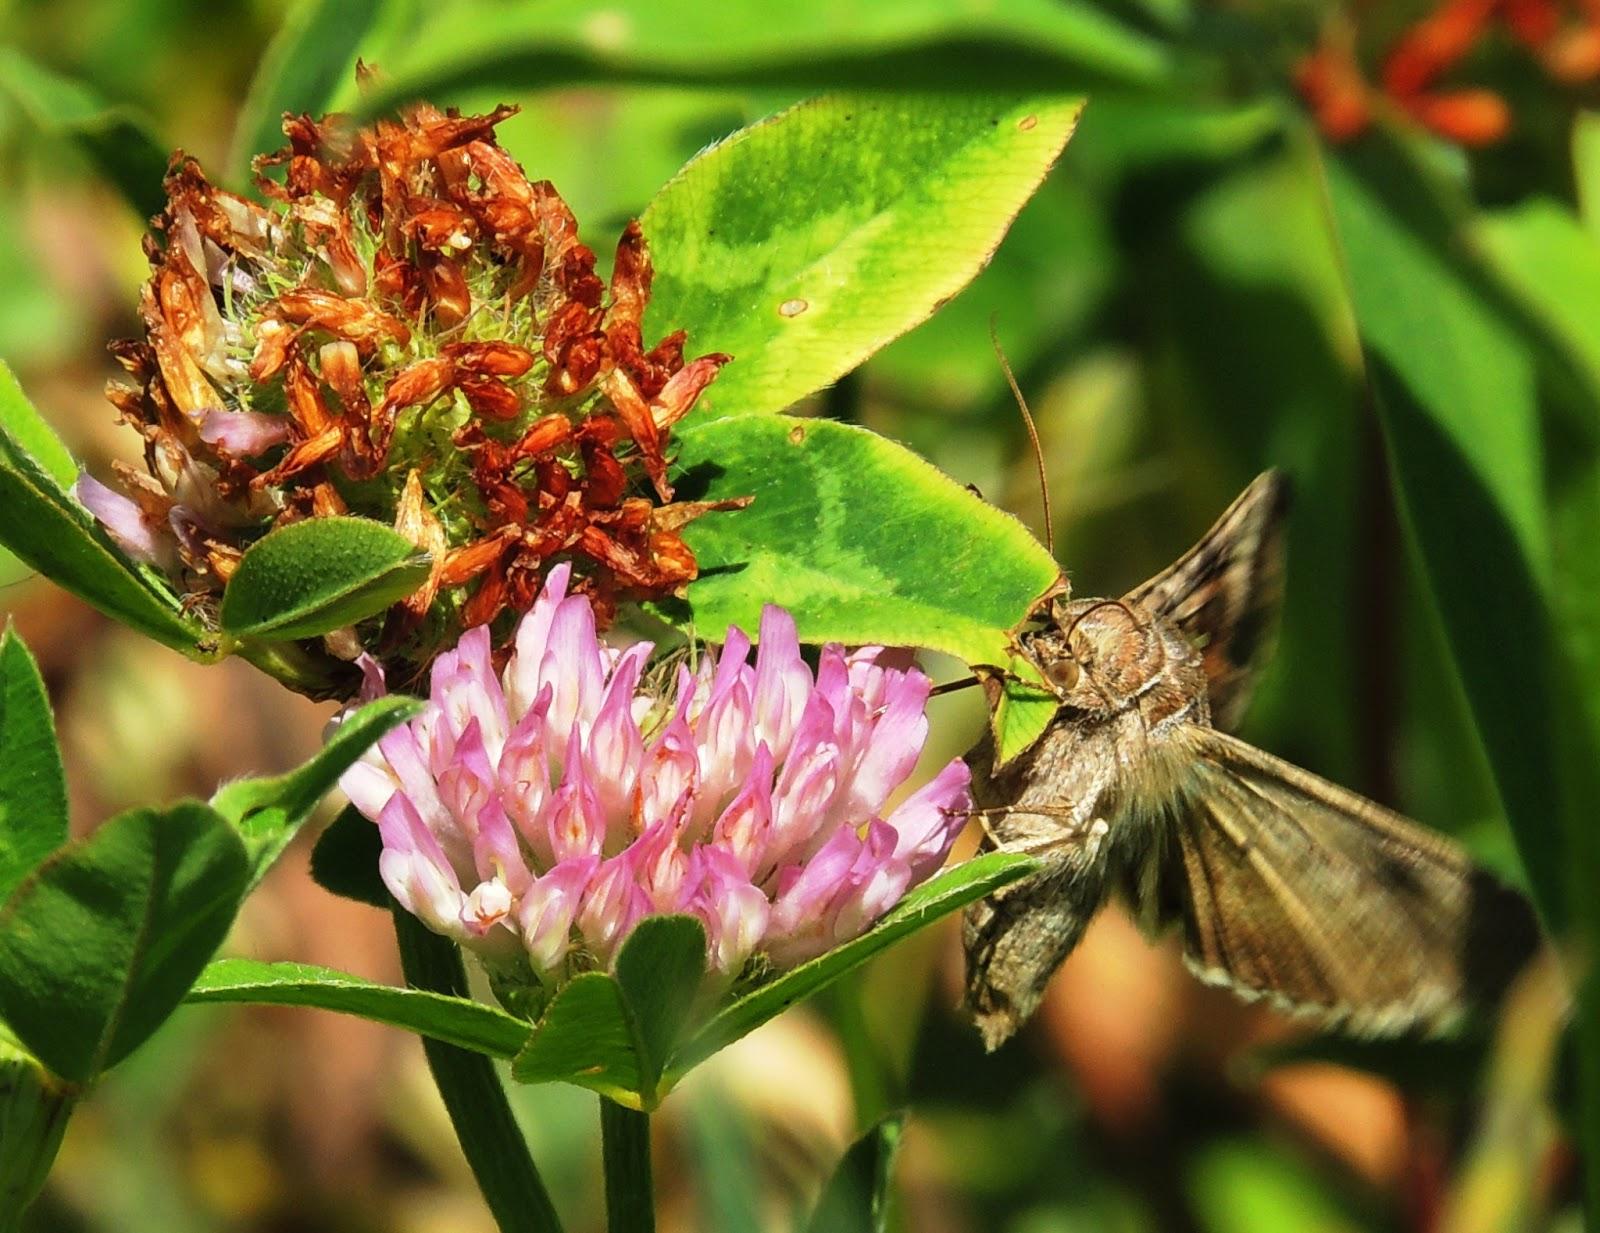 La mariposa libando néctar